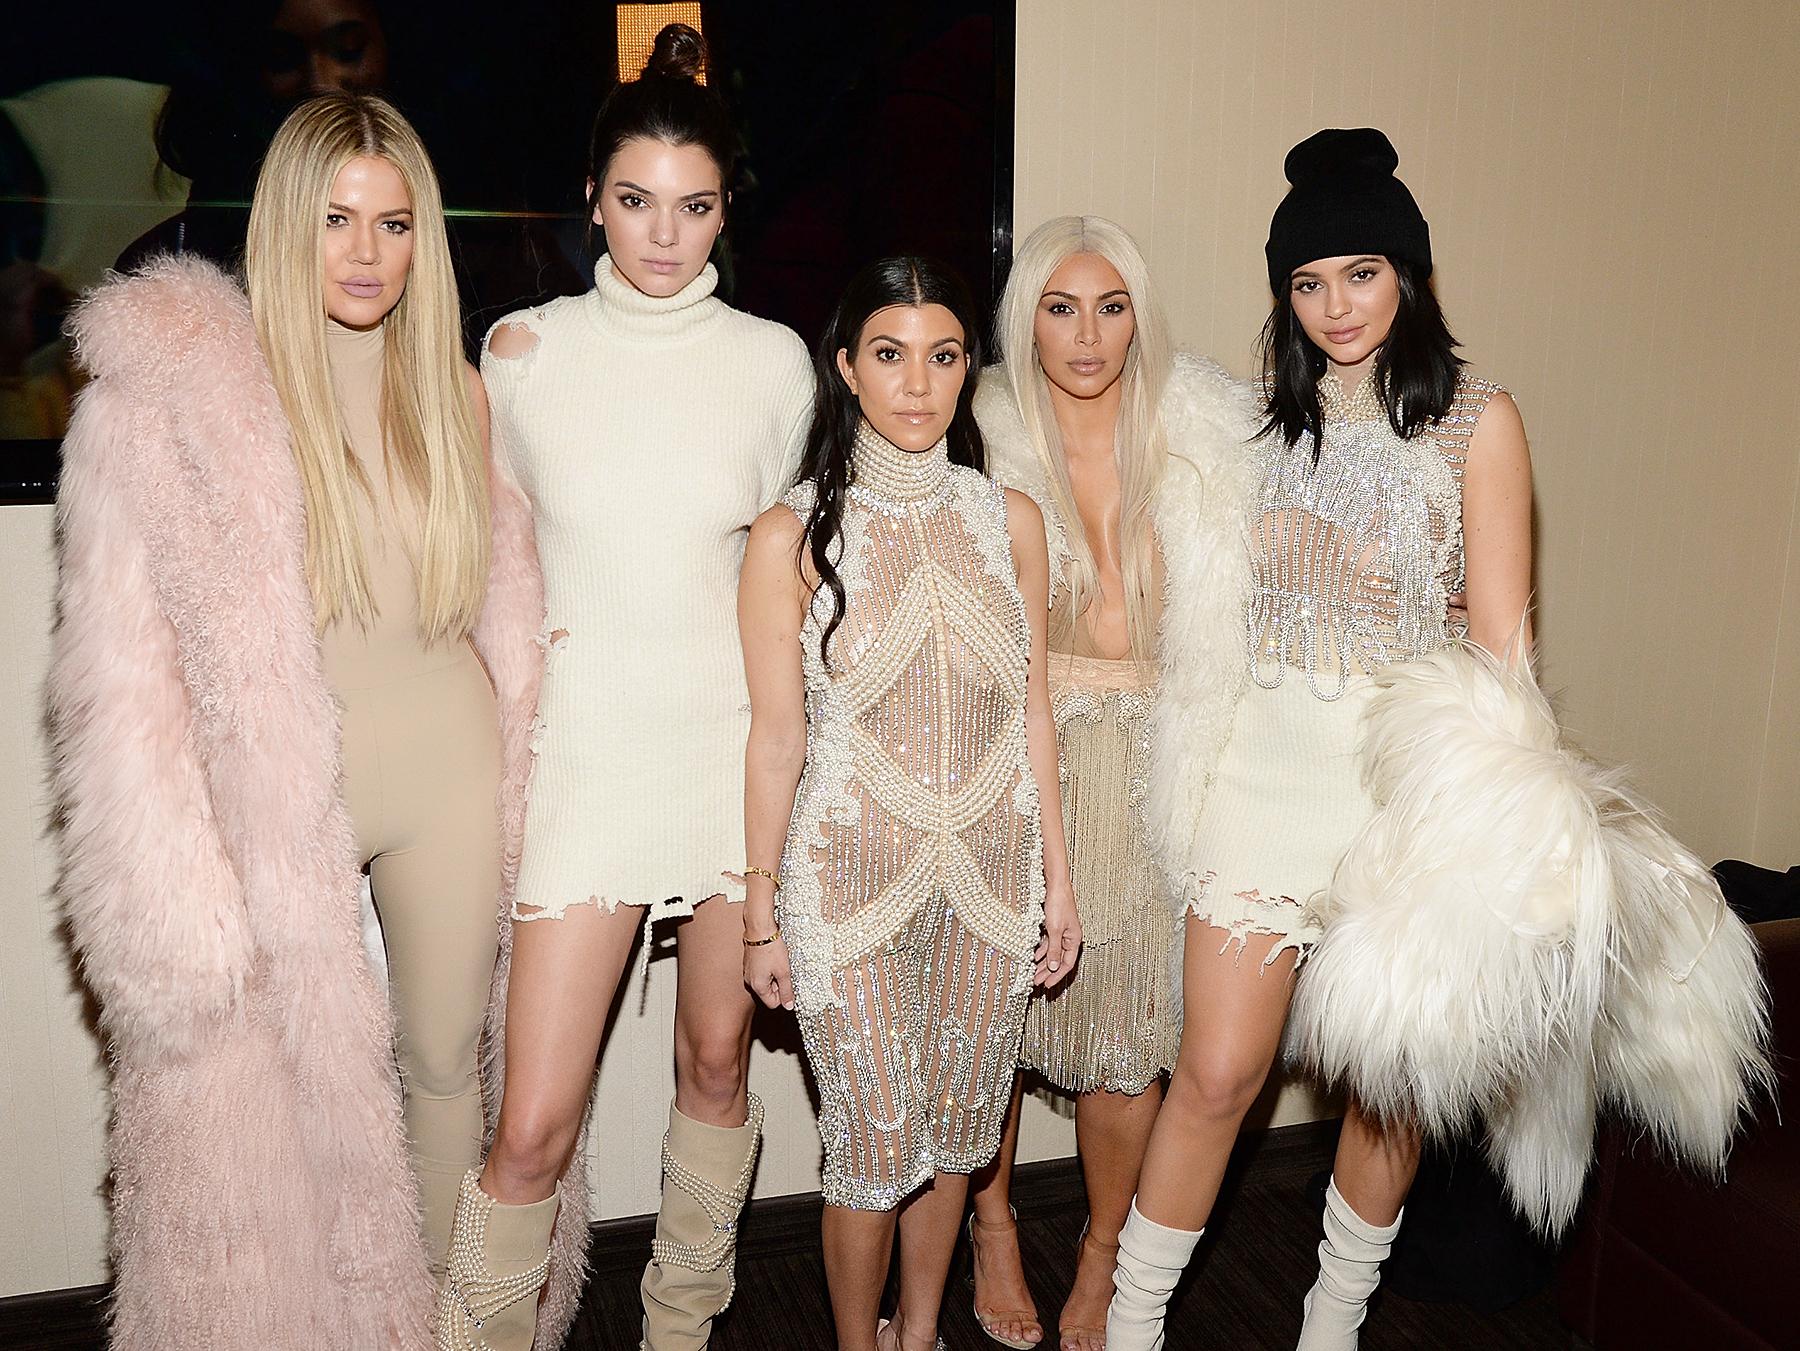 Khloe Kardashian, Kendall Jenner, Kourtney Kardashian, Kim Kardashian West Kylie Jenner